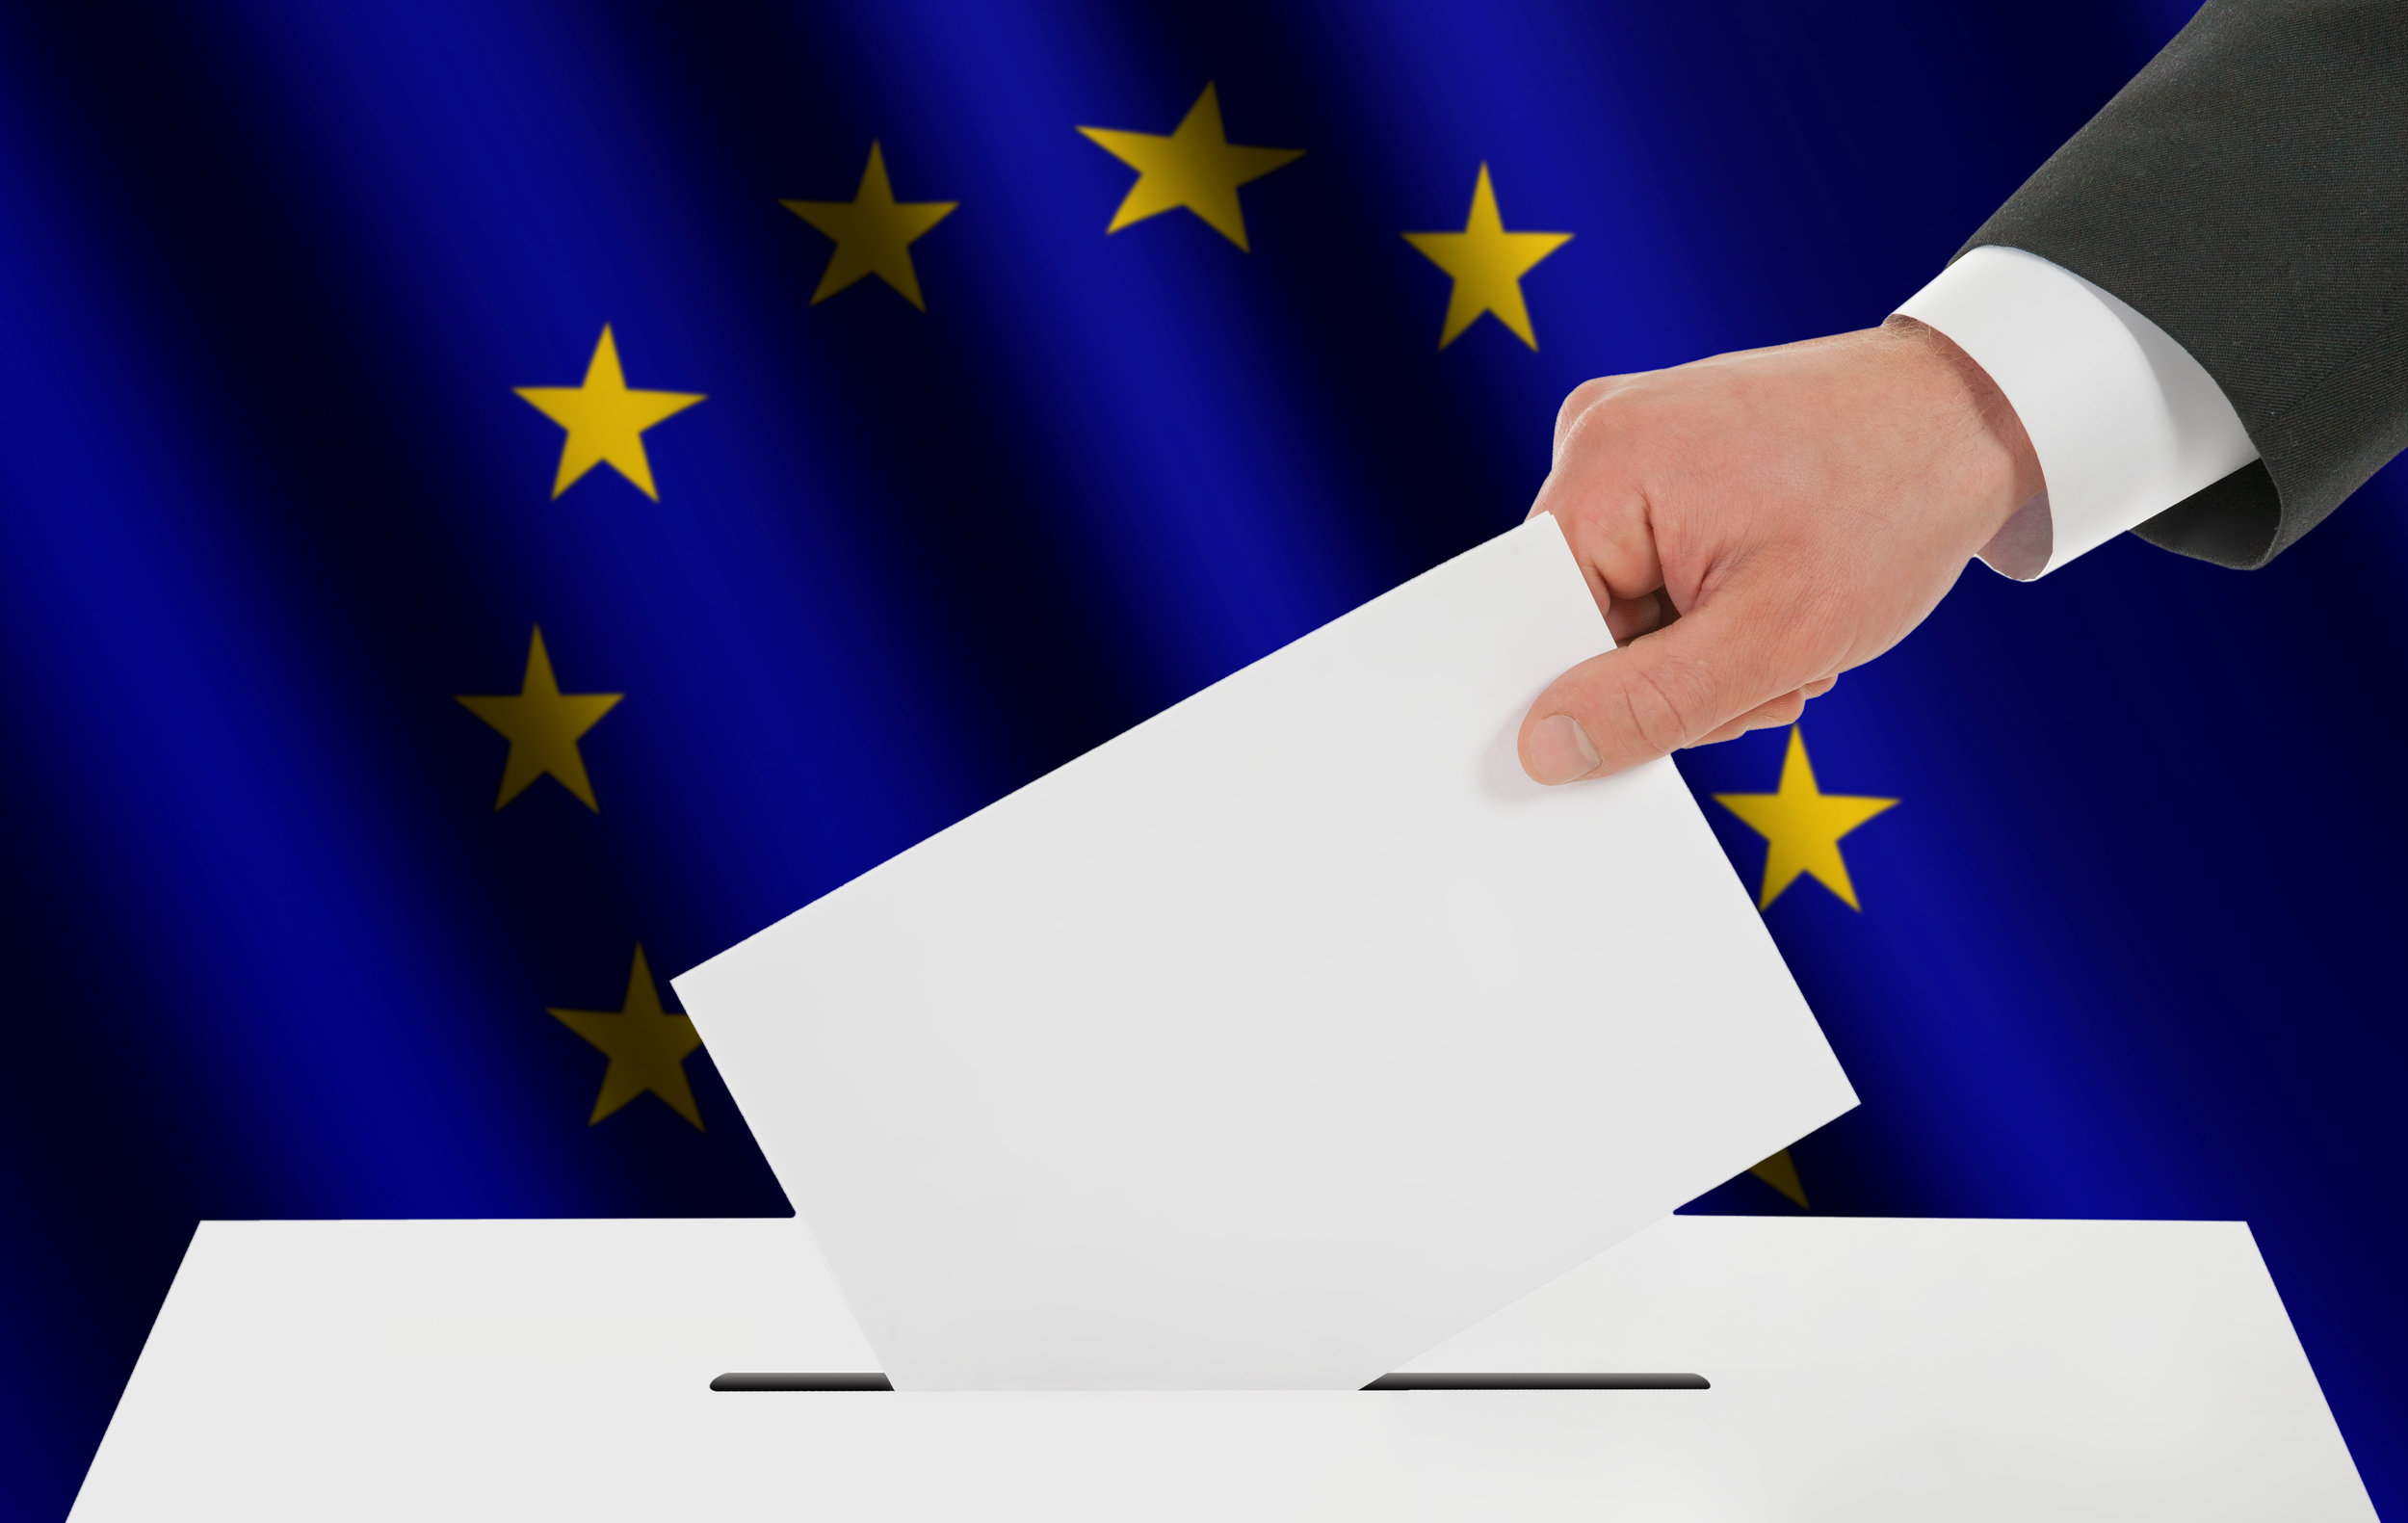 eu-valg-stemmeboks-colourbox_0.jpg